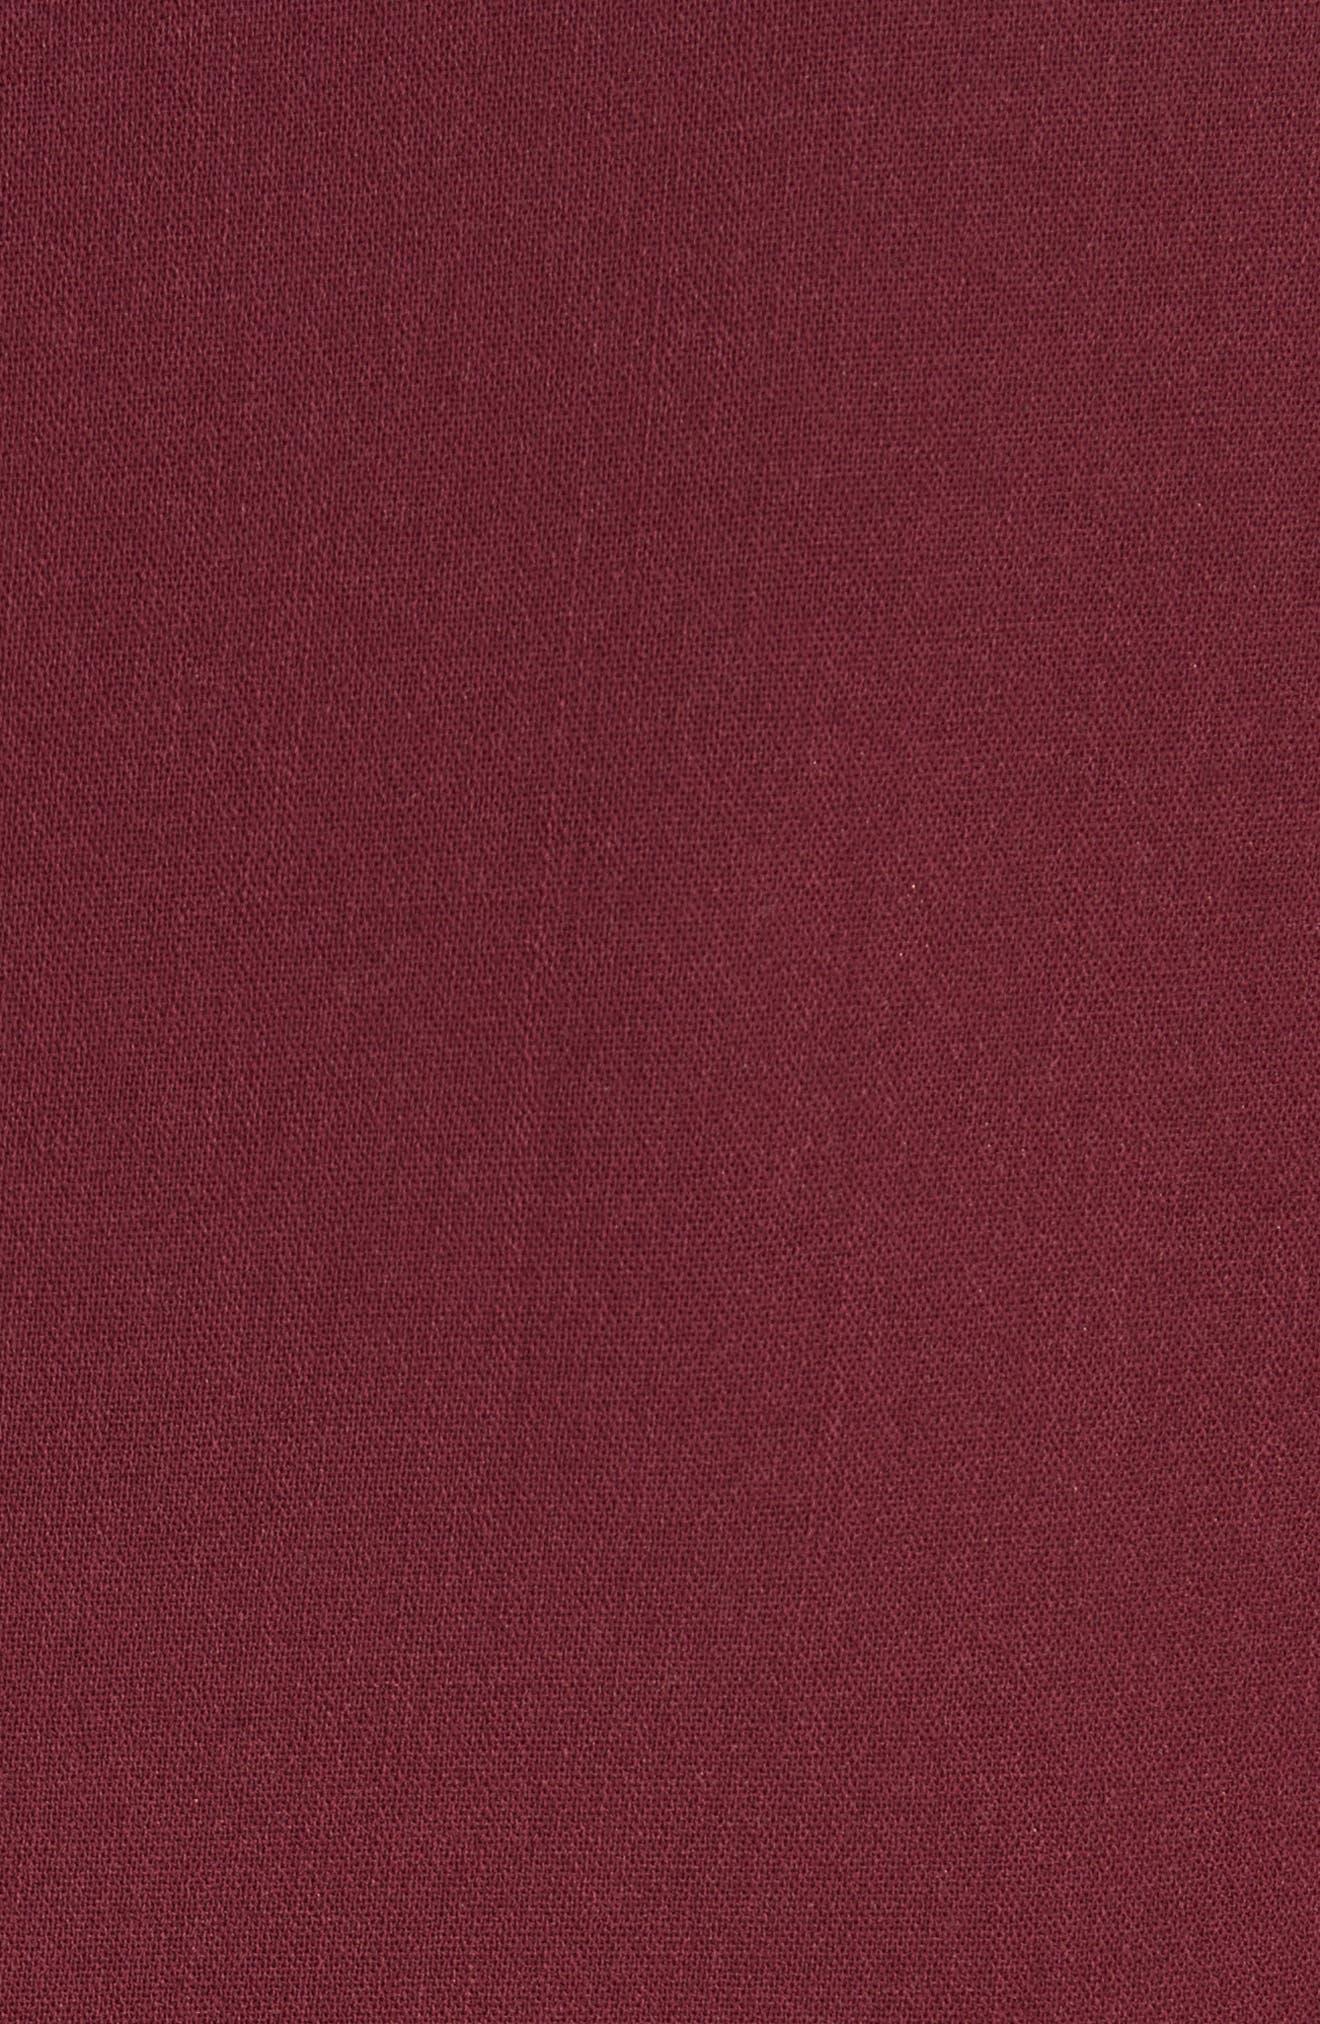 Bell Cuff Sheath Dress,                             Alternate thumbnail 3, color,                             Merlot